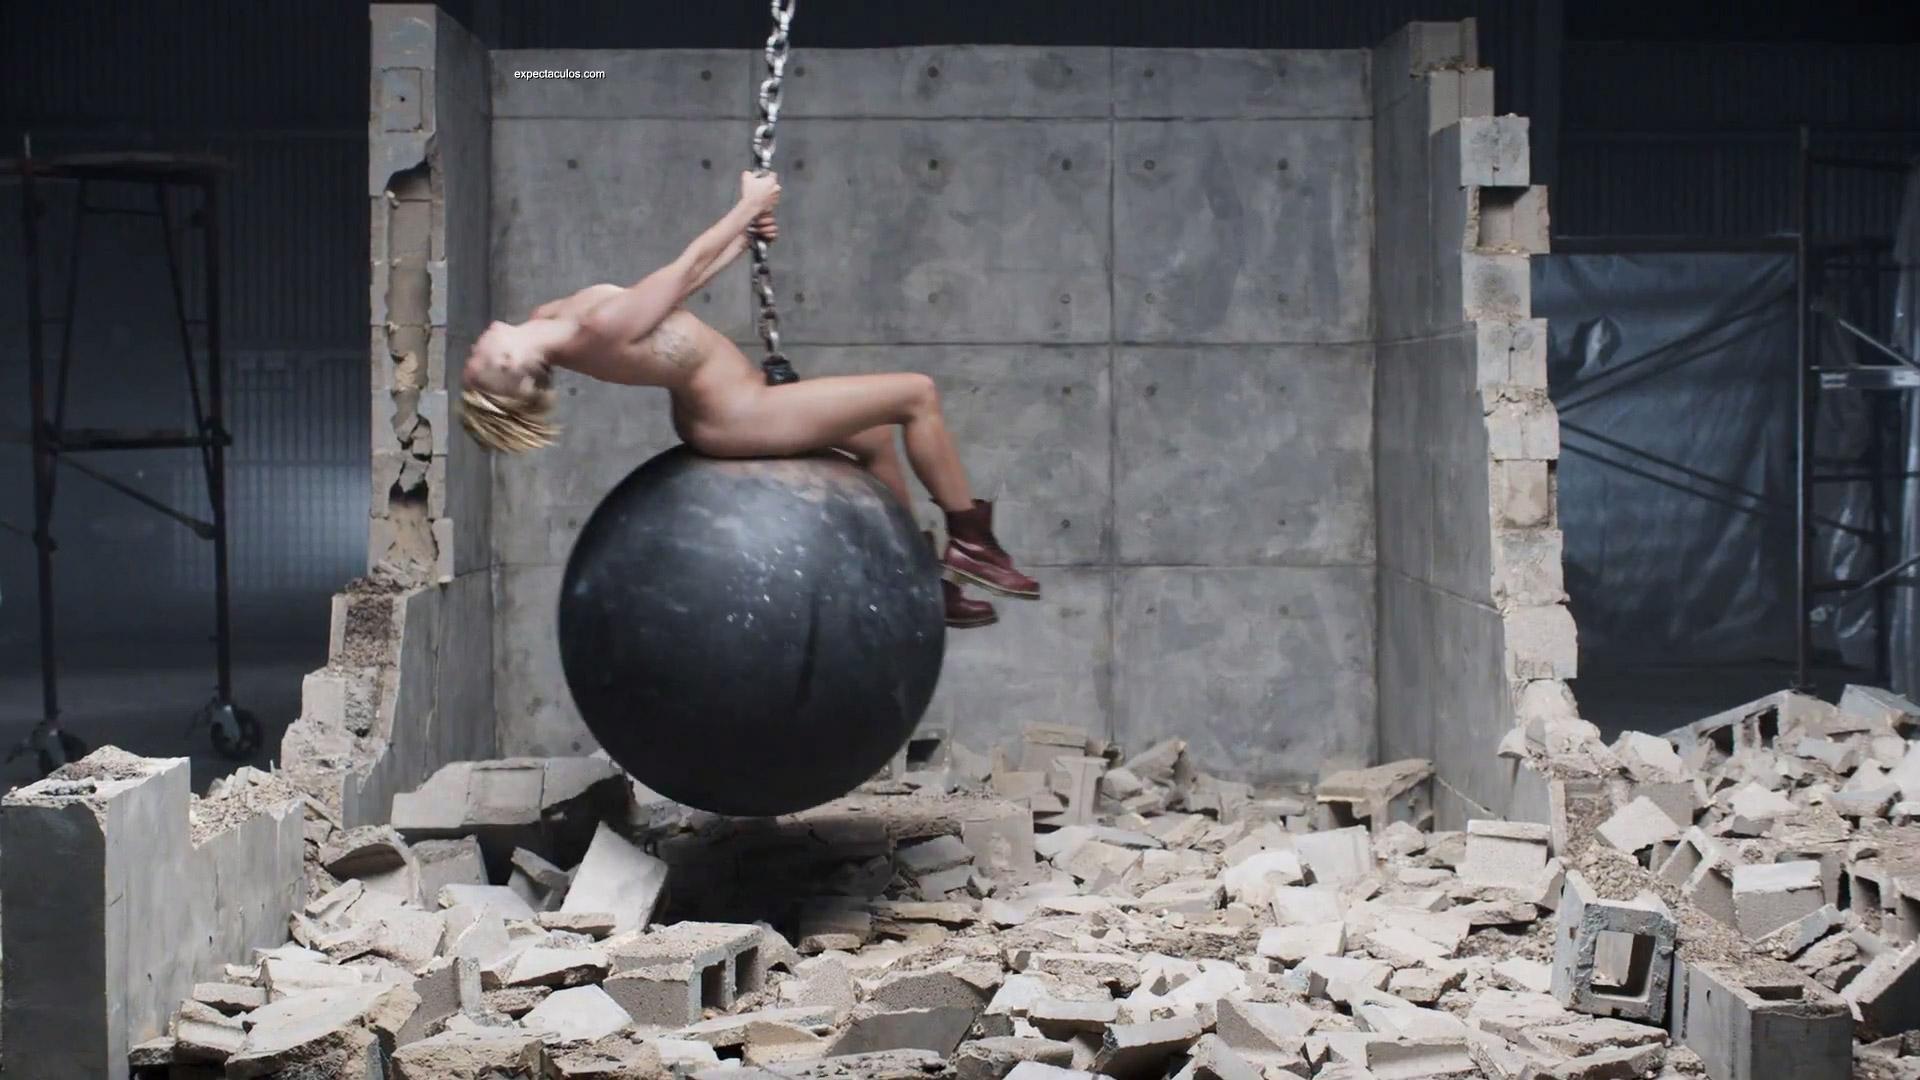 Miley Cyrus Naked Wrecking Ball